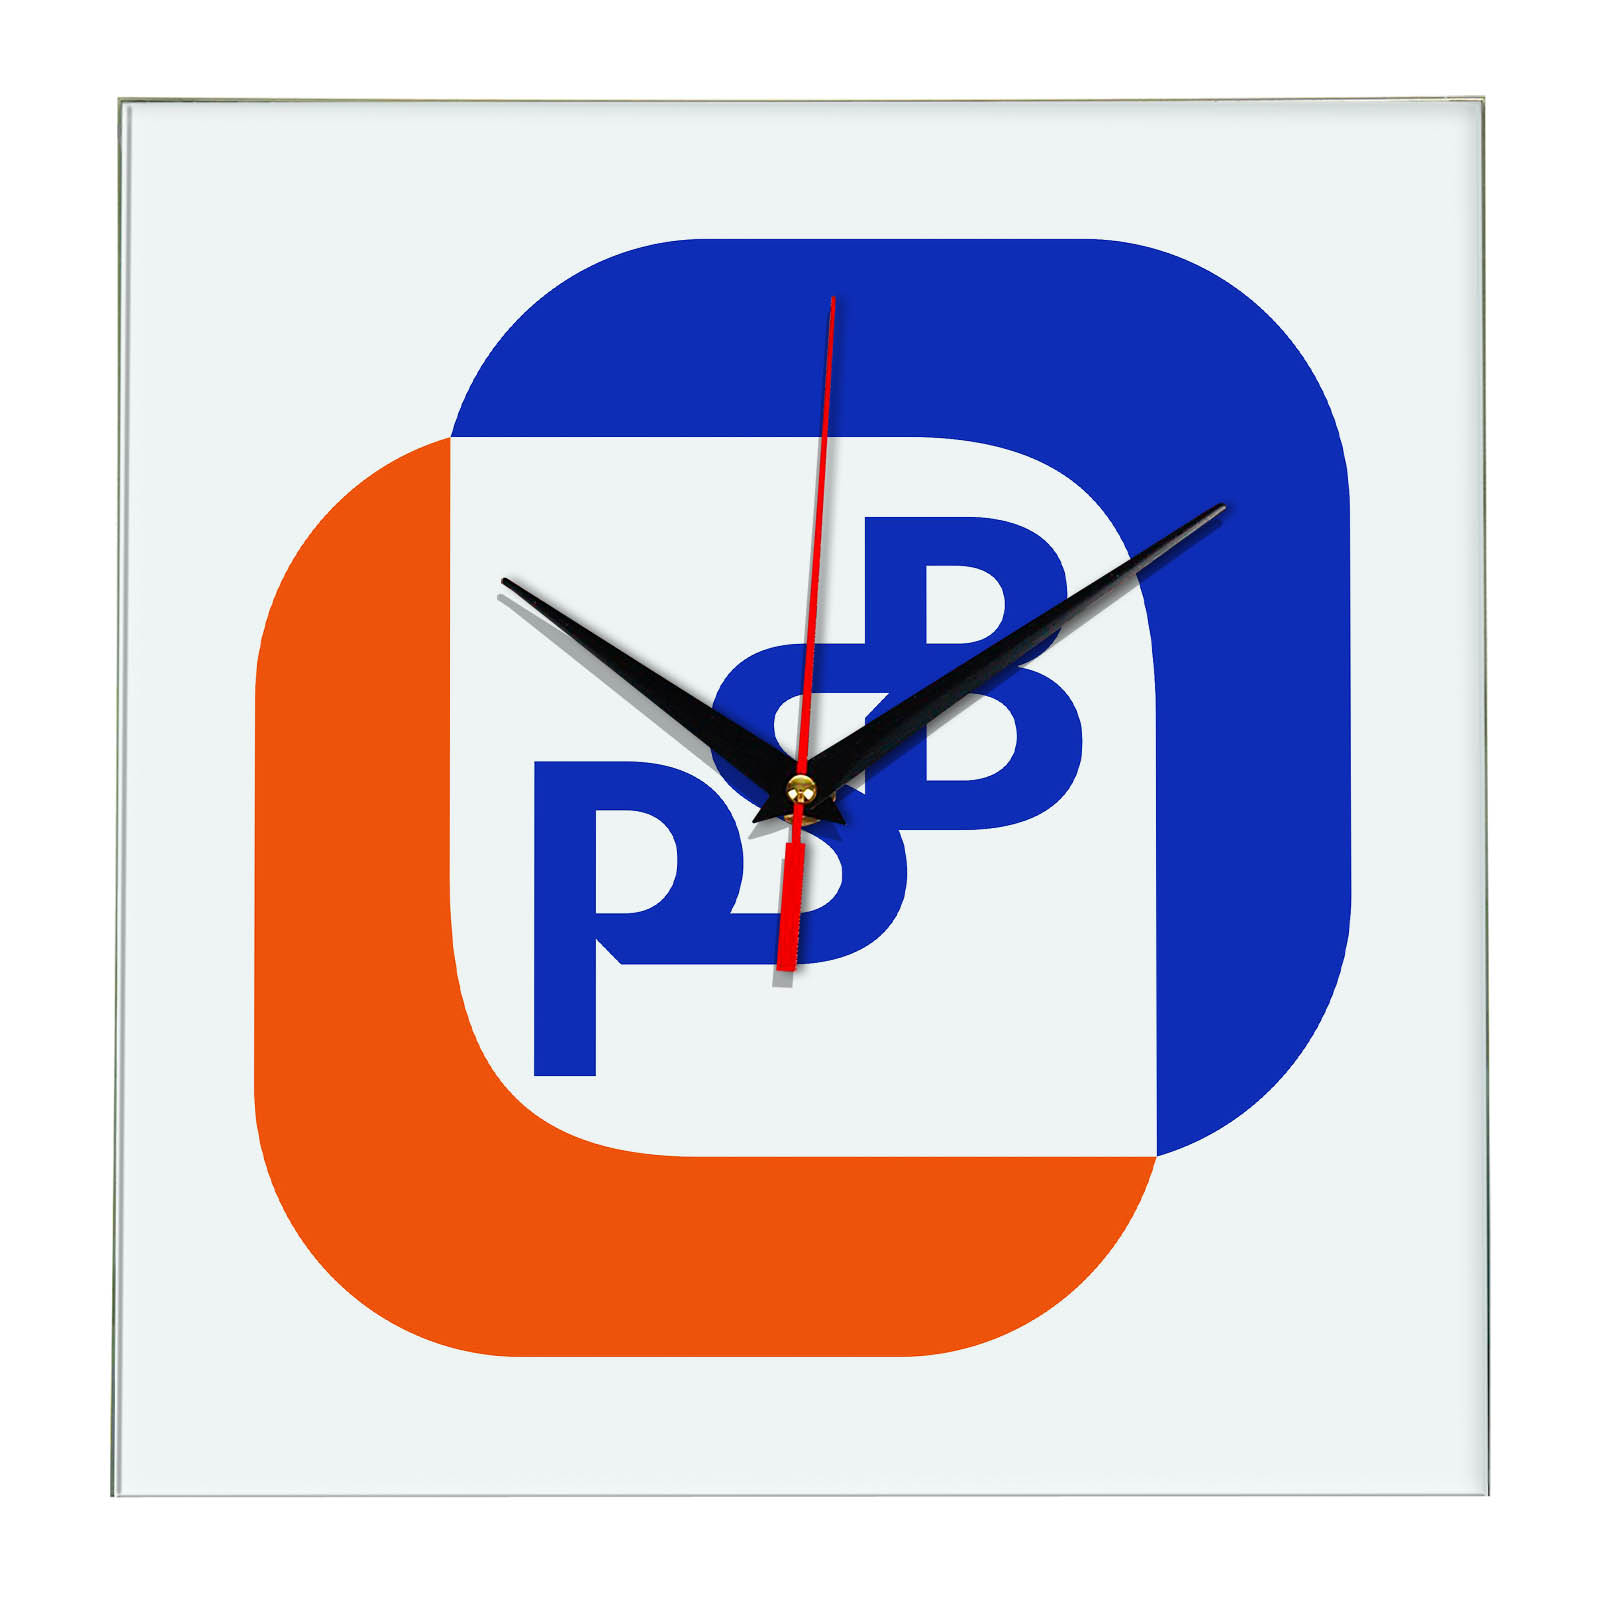 PSB_0013_svetl-kvadtat